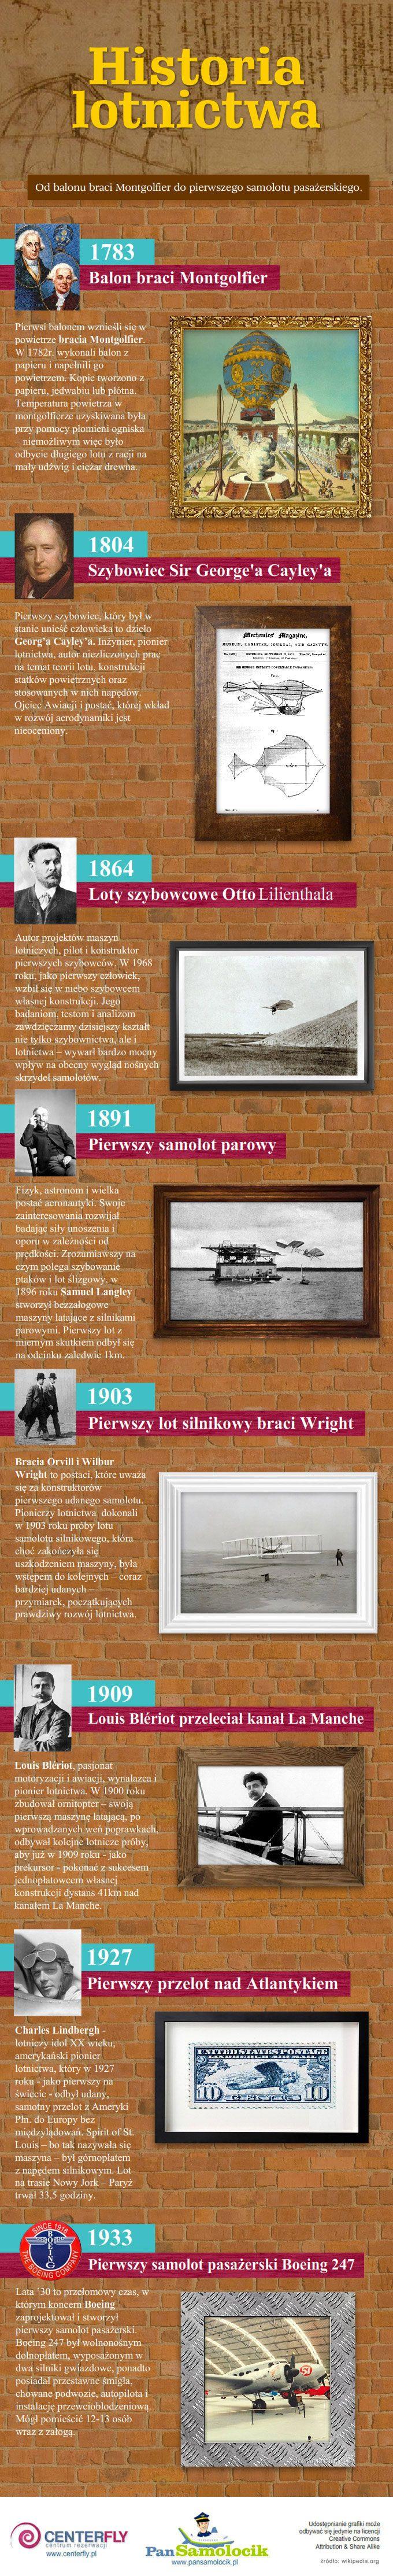 Historia Lotnictwa - Infografika  http://www.nlogo.pl/portfolio/infografika-historia-lotnictwa